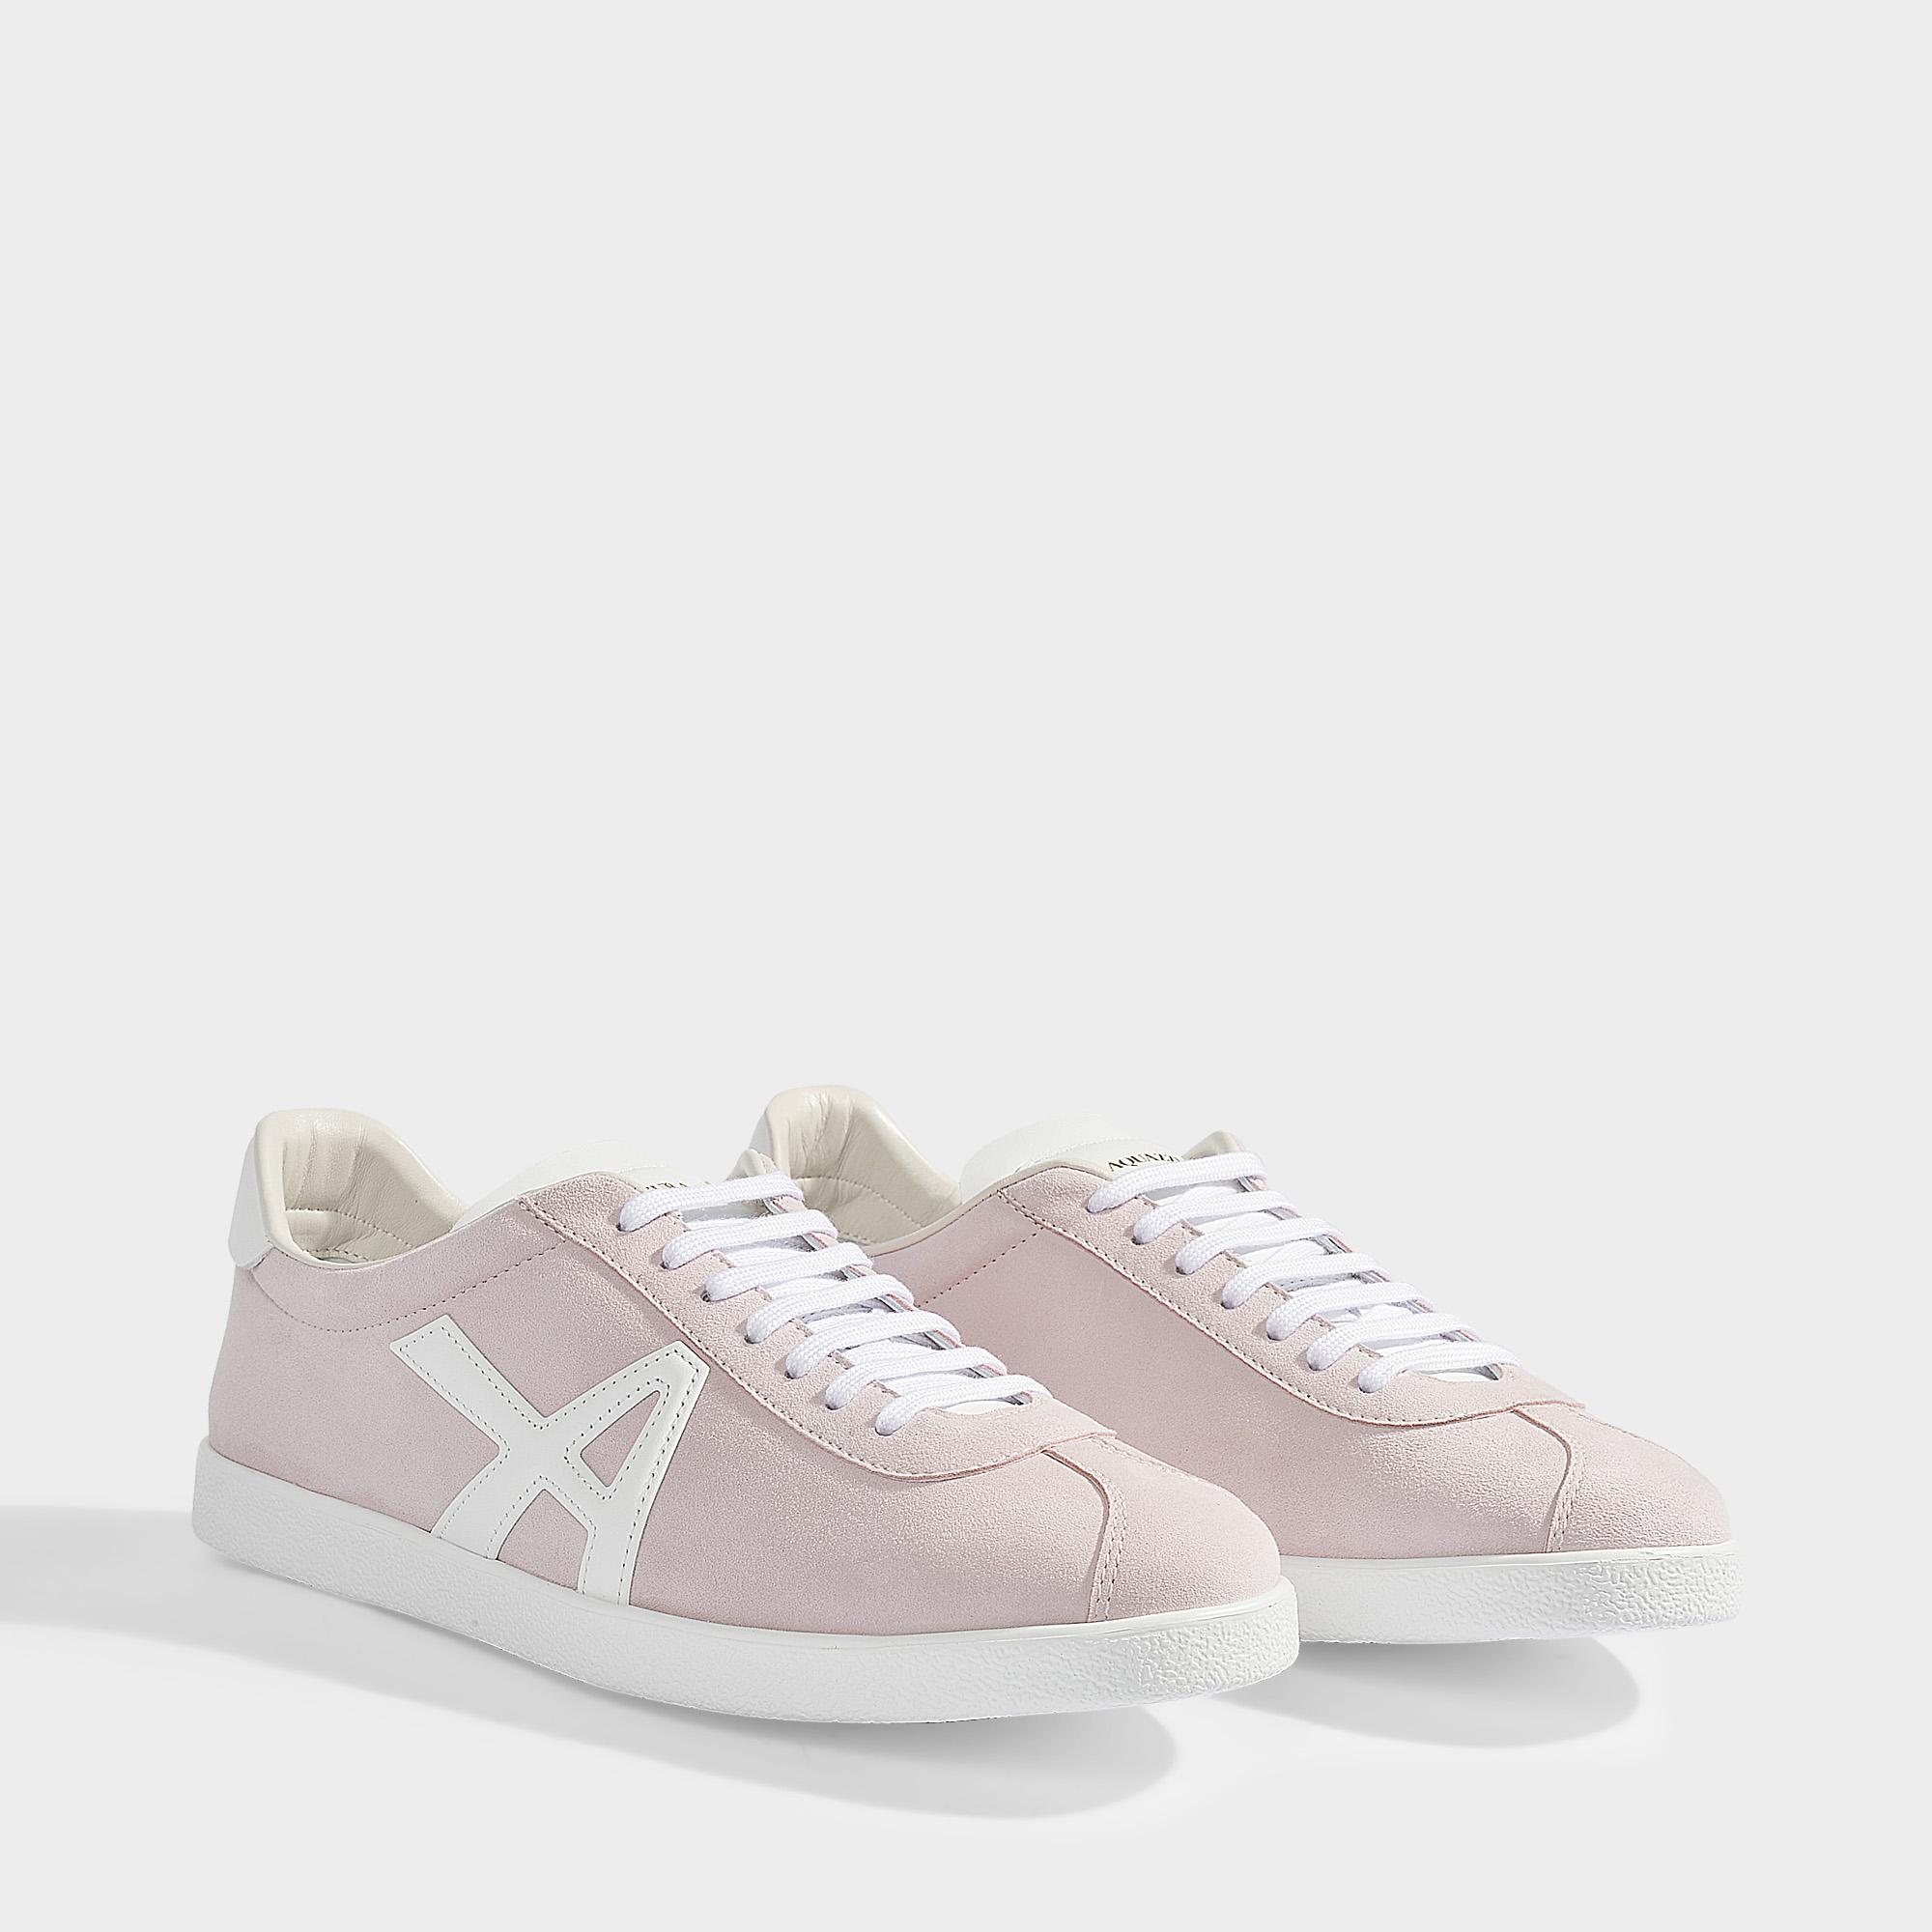 Aquazzura Und Rosa Weißem Wildleder A Sneakers The Aus Sneaker OuXZkiP